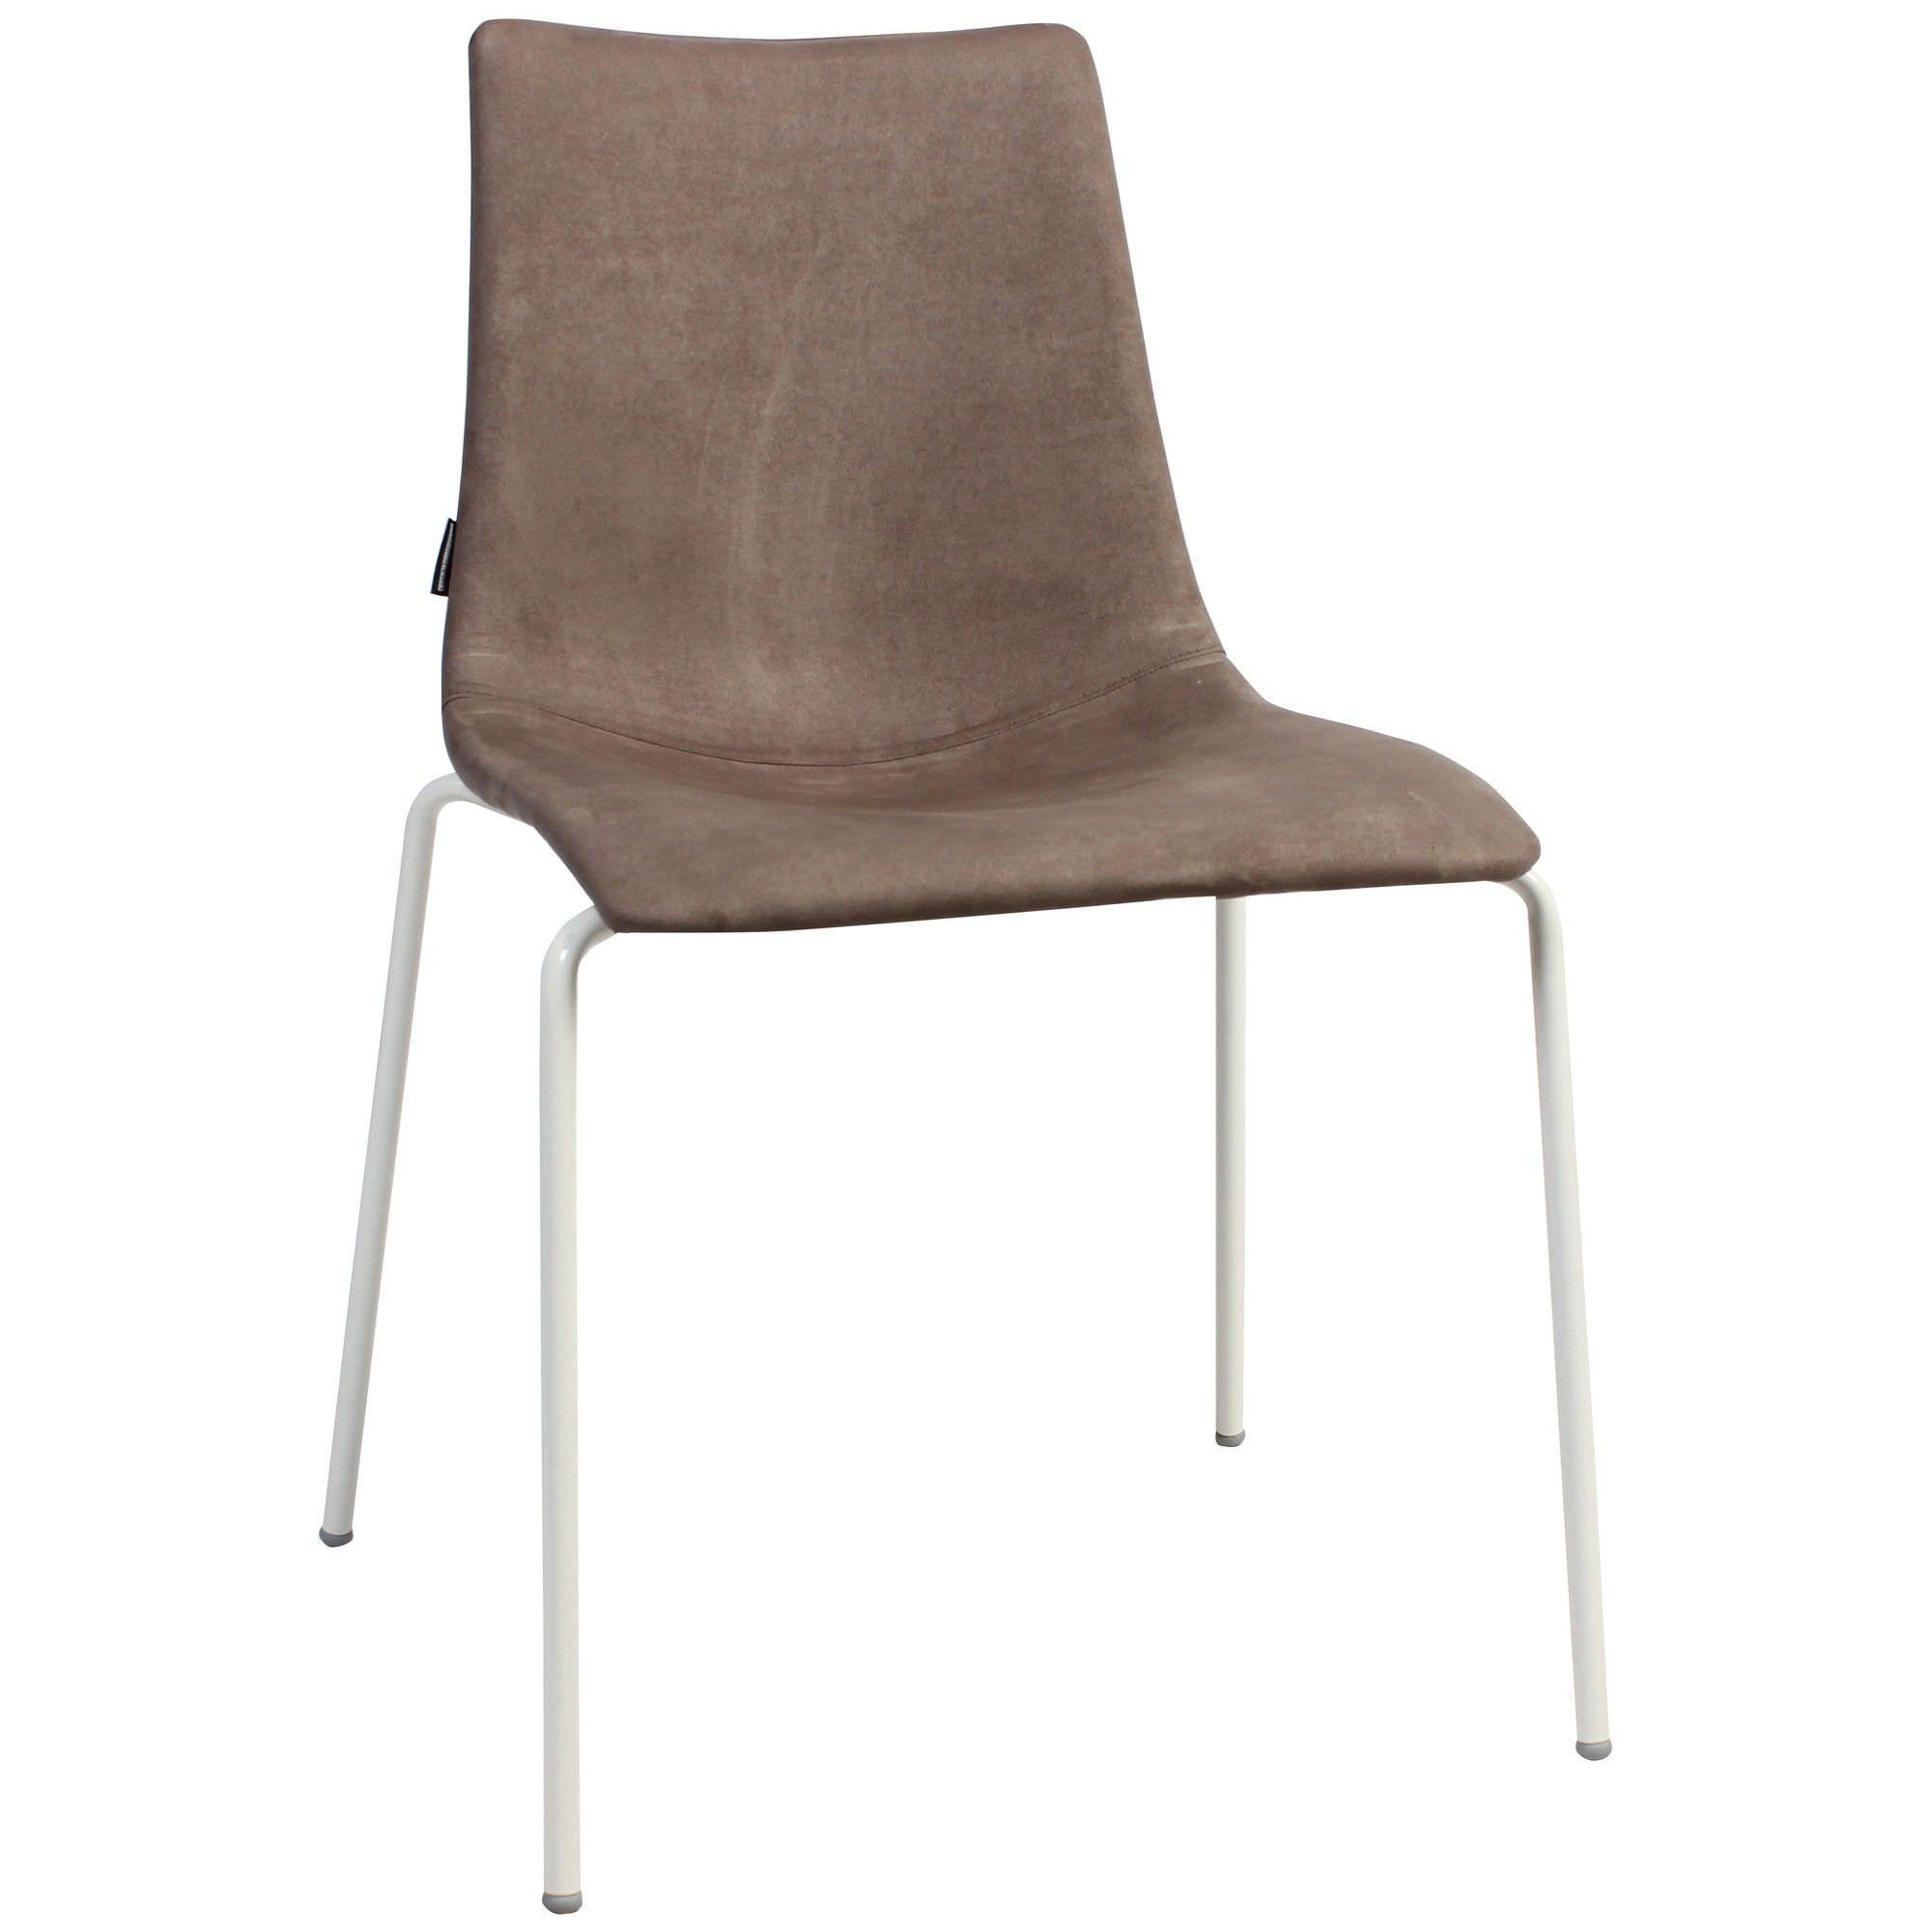 Zebra Pop Italian Made Commercial Grade Fabric Dining Chair, Metal Leg, Brown / White